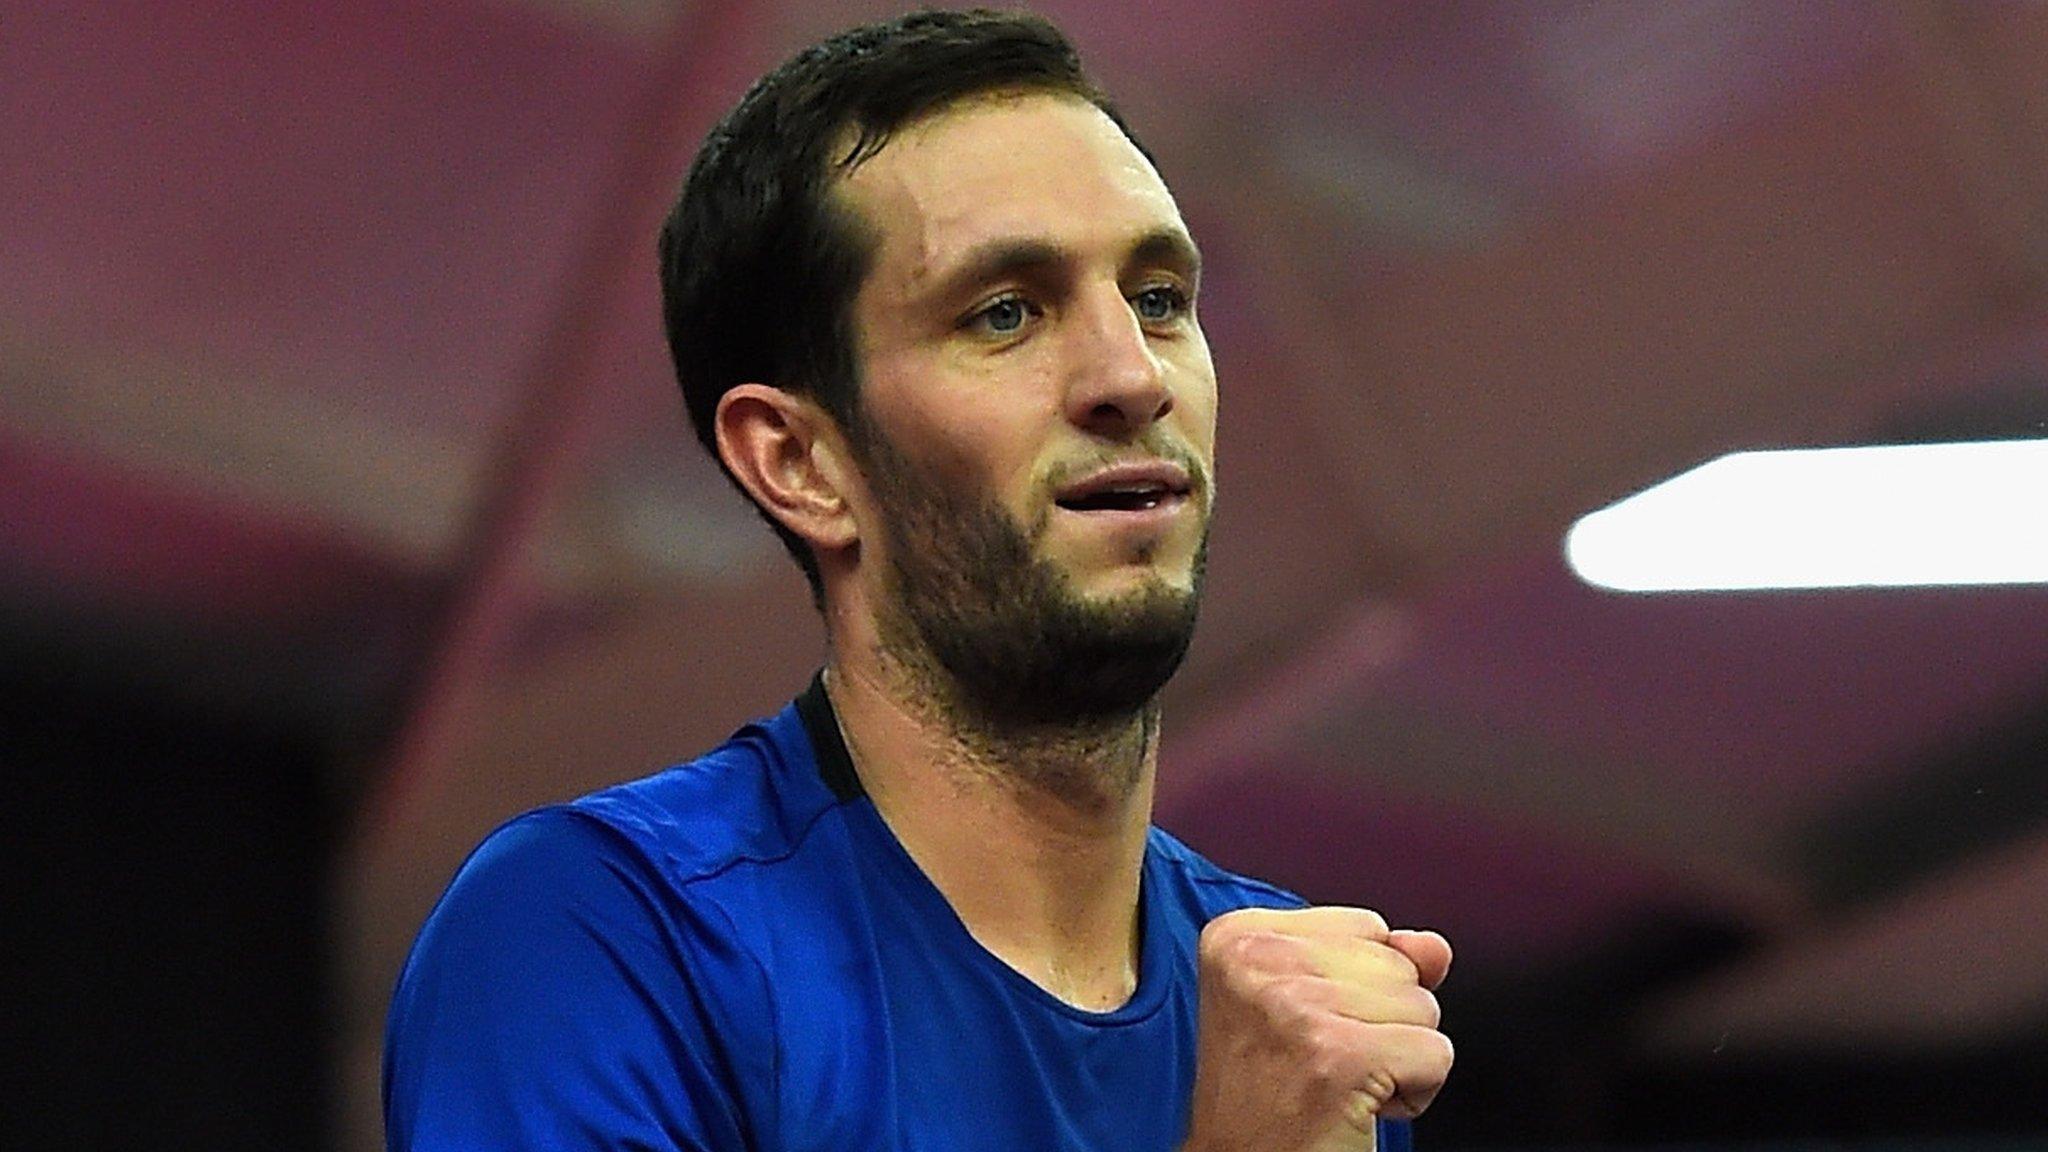 Loughborough Trophy: Hiroki Moriya beat James Ward to win ATP Challenger Tour title